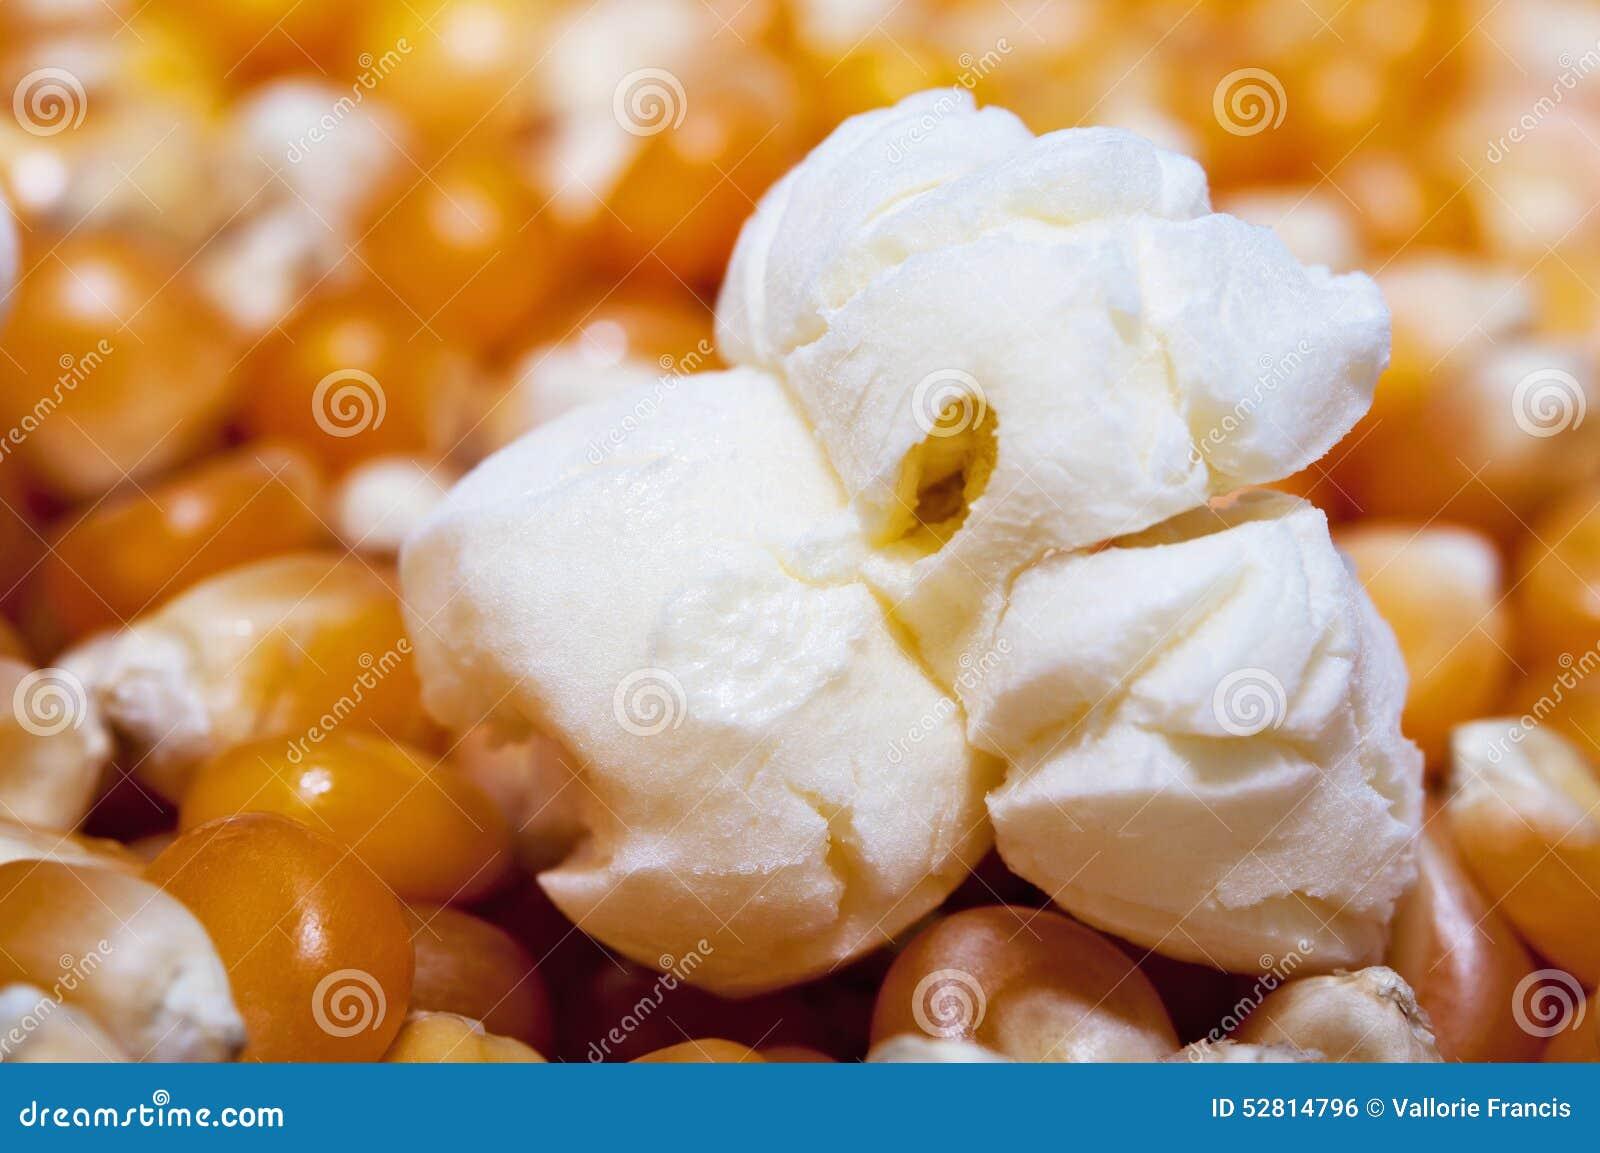 Unpopped Popcorn Kernel Clipart Popcorn popped on corn kernels